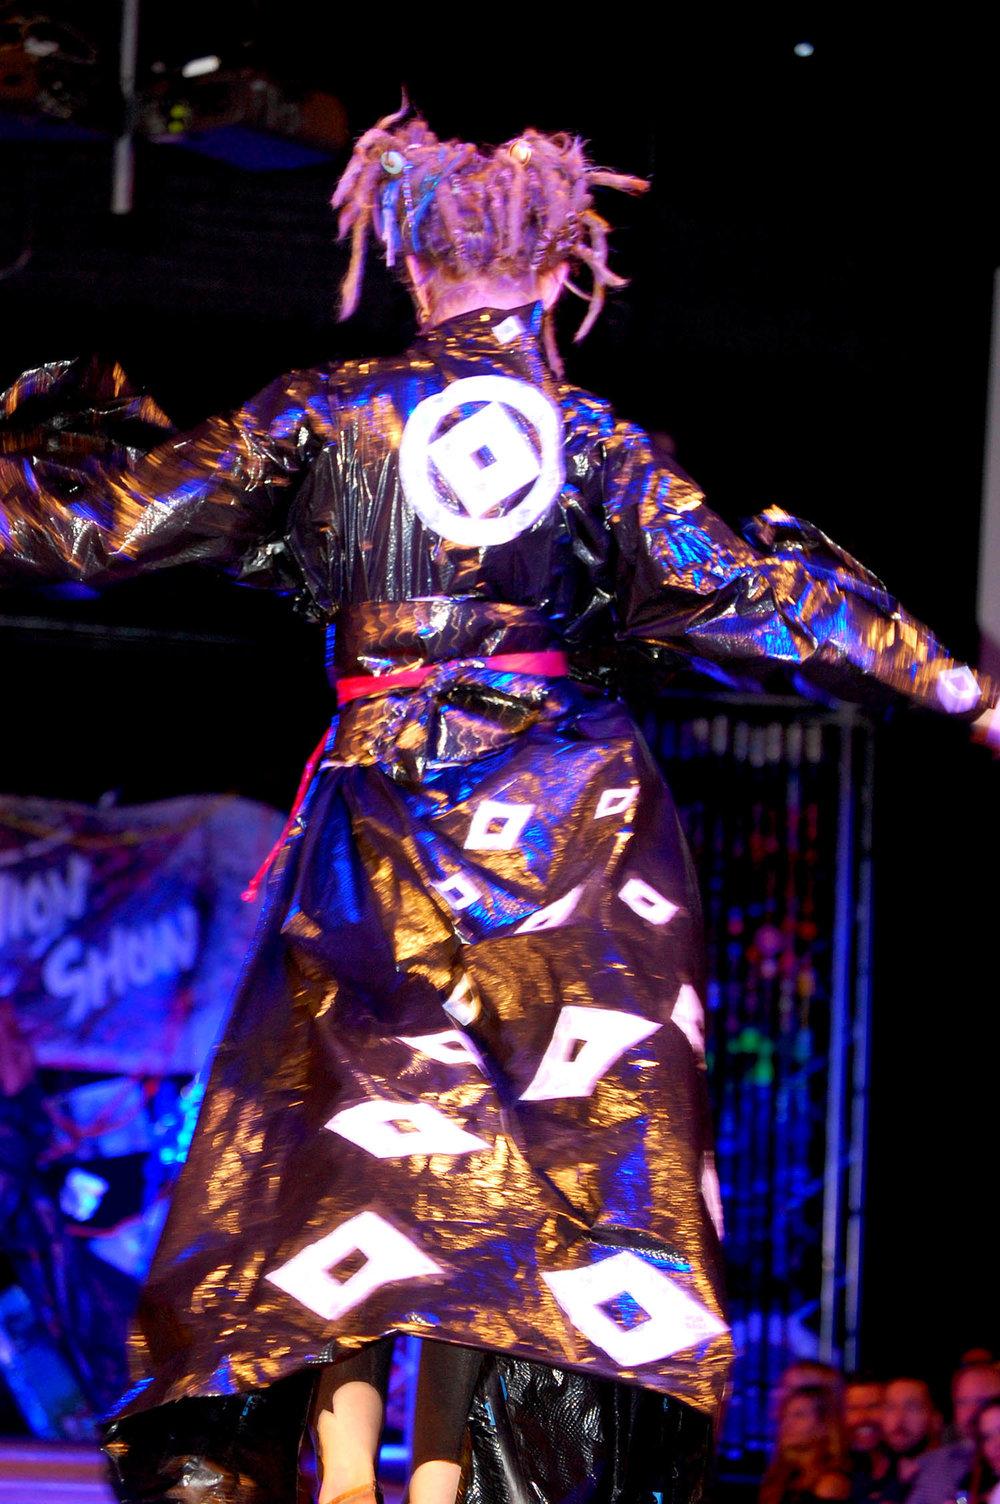 kimono1-julianb.jpg